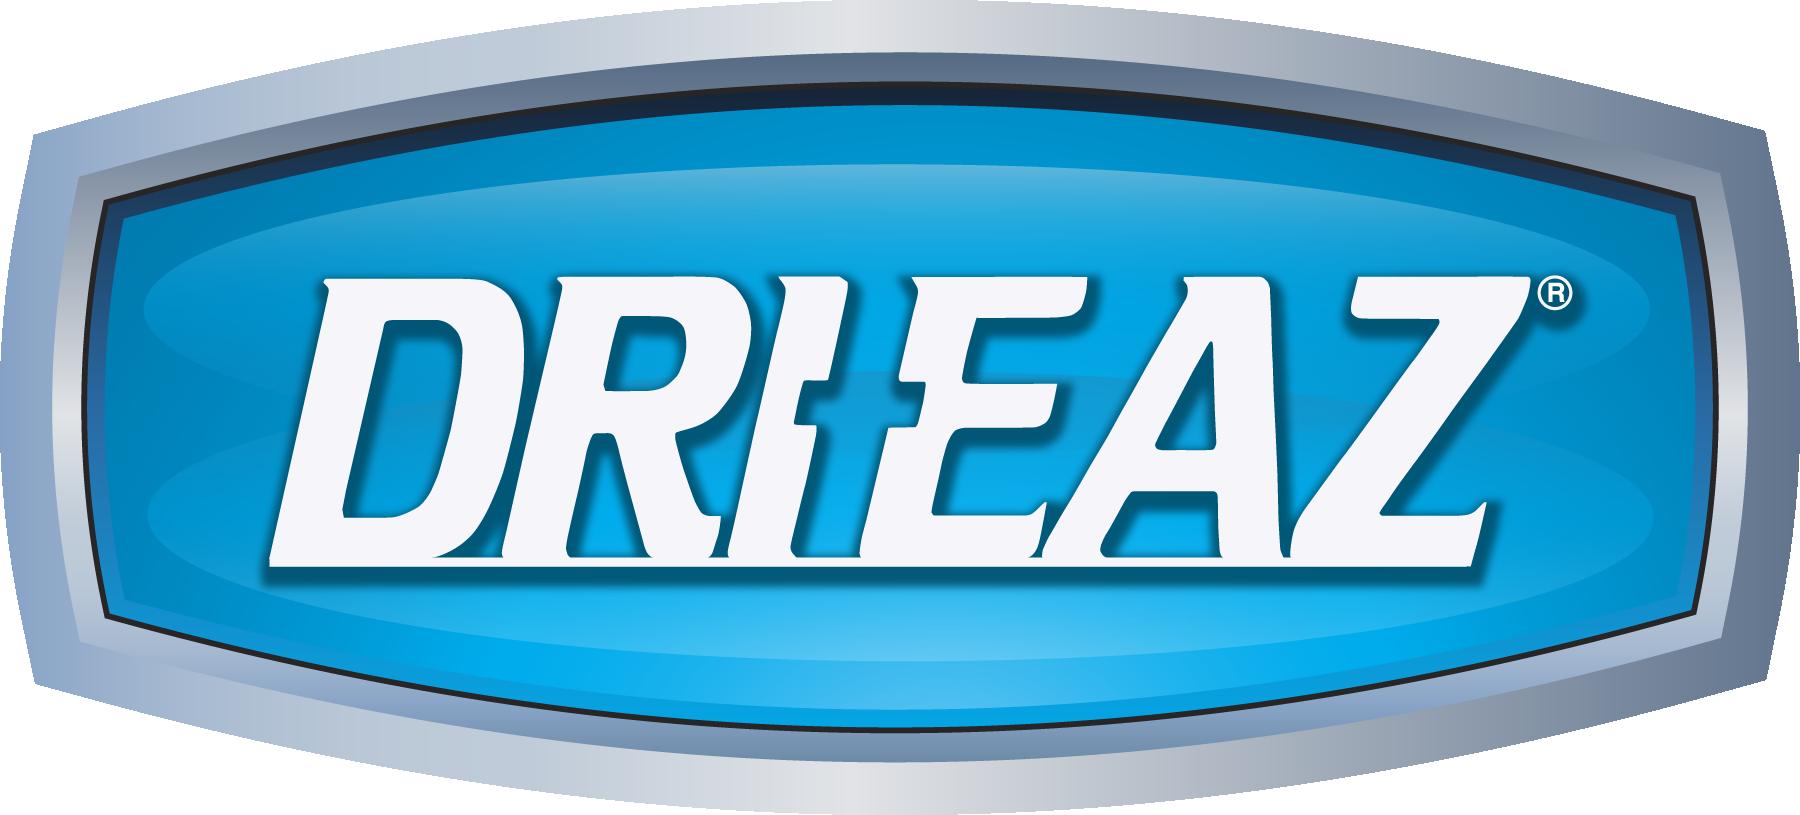 dri-eaz-logo-high-resff6.png